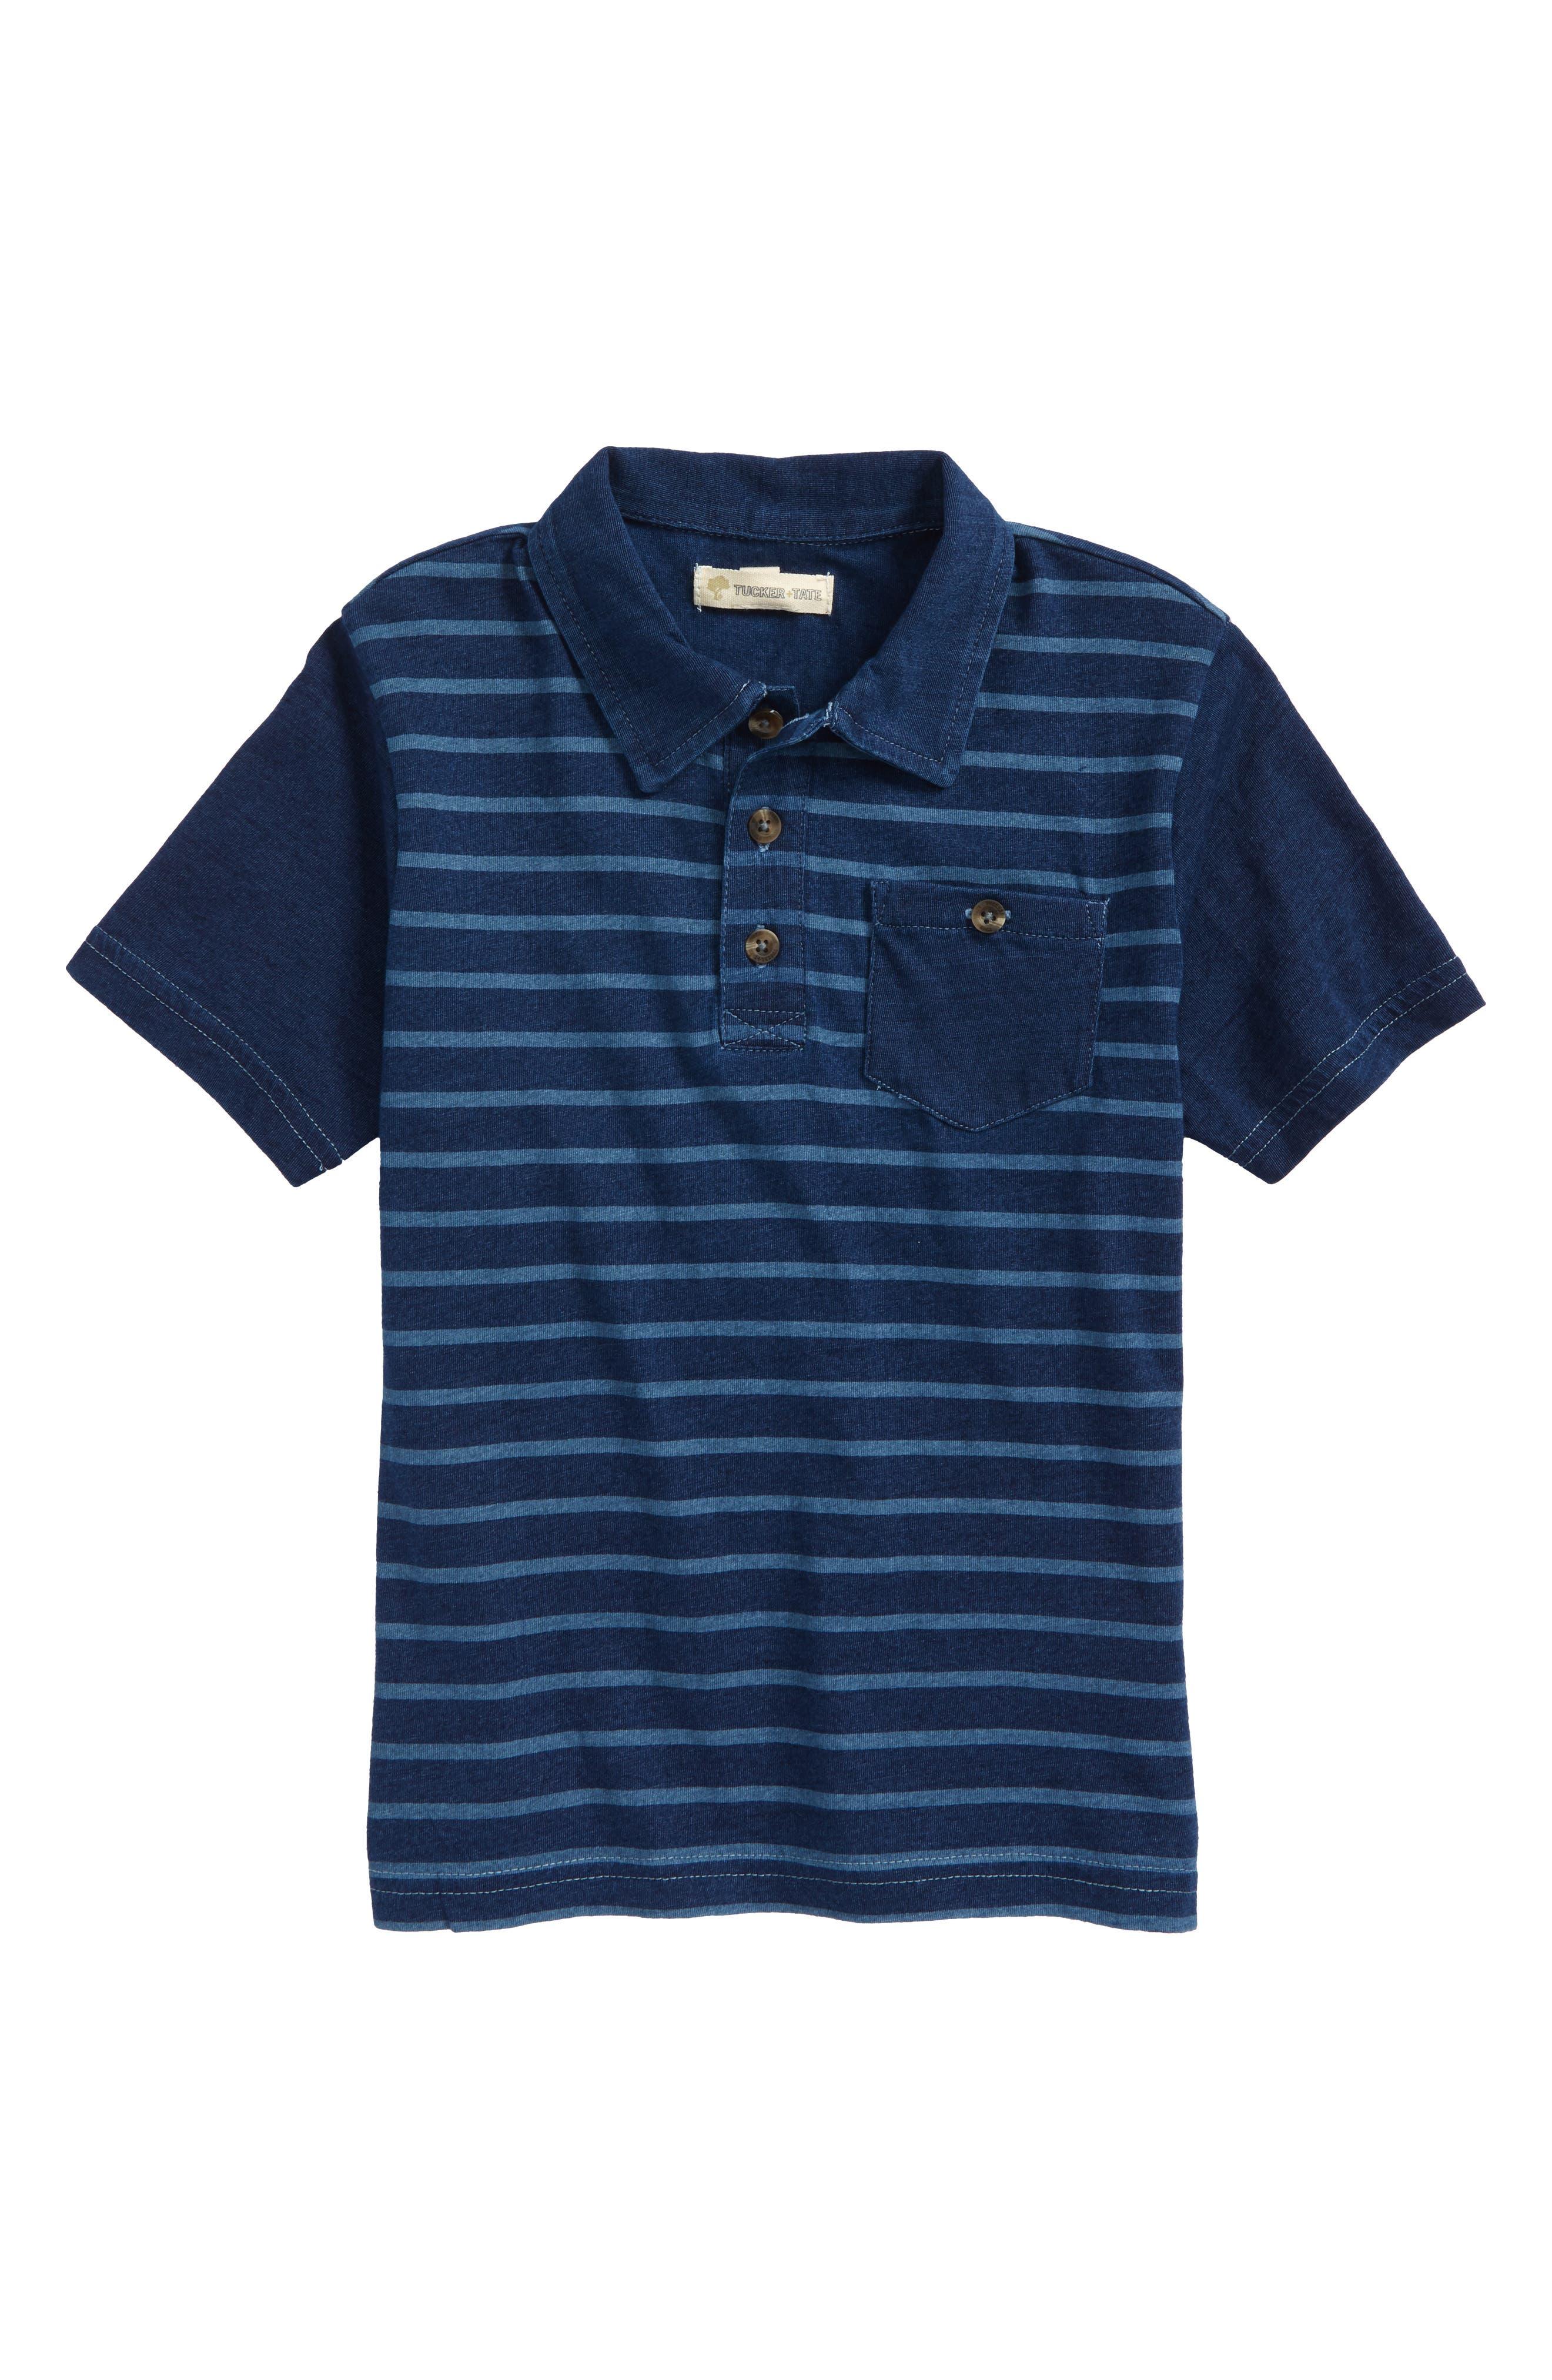 Stripe Polo,                             Main thumbnail 1, color,                             Navy Denim Stripe